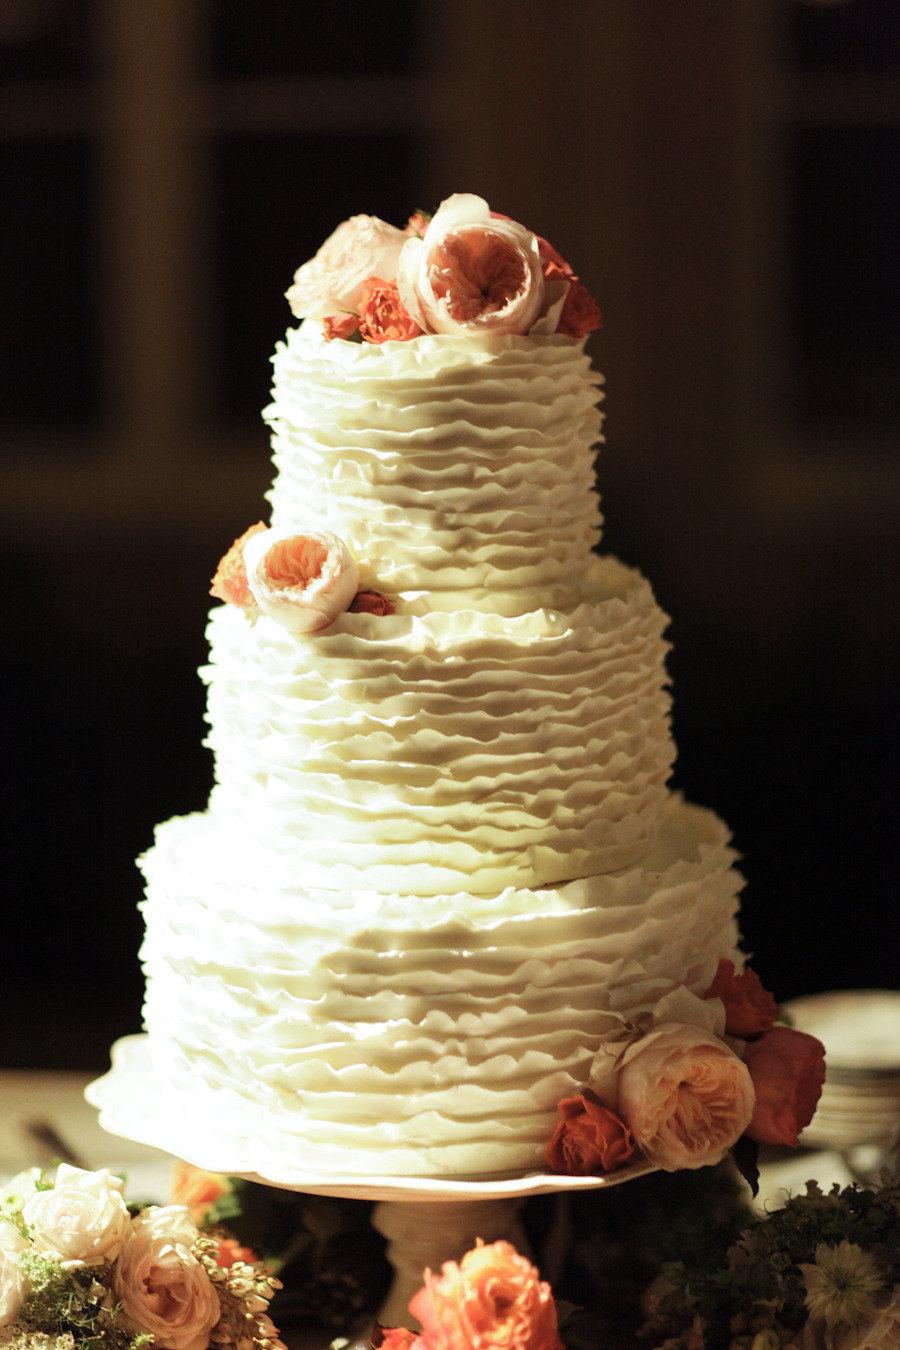 44_gia_canali_molly_sims wedding cake salmon pink roses